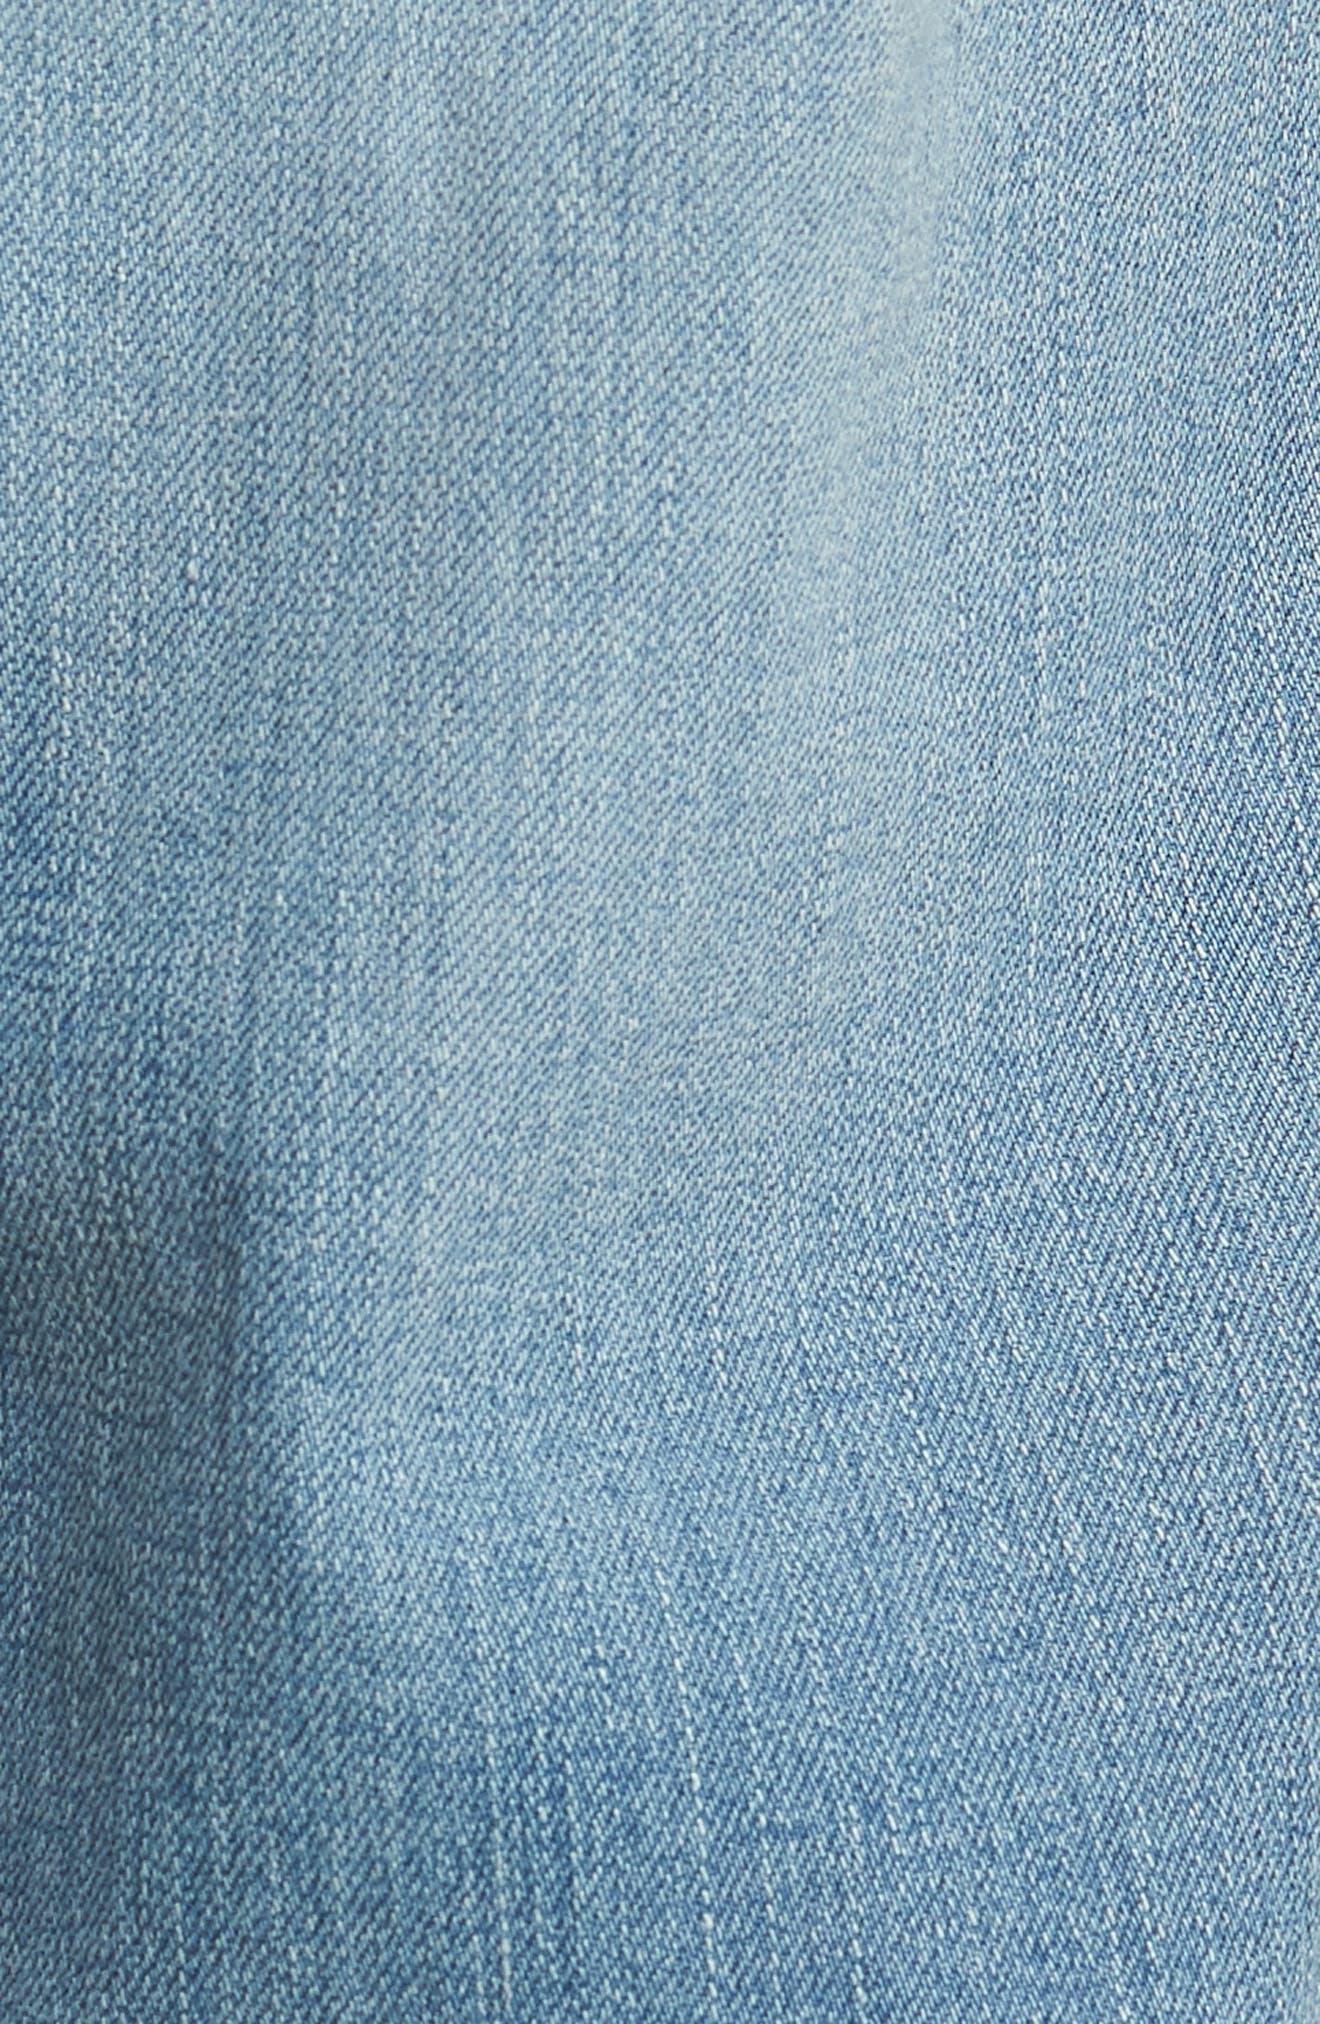 Graduate Slim Straight Leg Jeans,                             Alternate thumbnail 5, color,                             19 YEARS CHANNEL